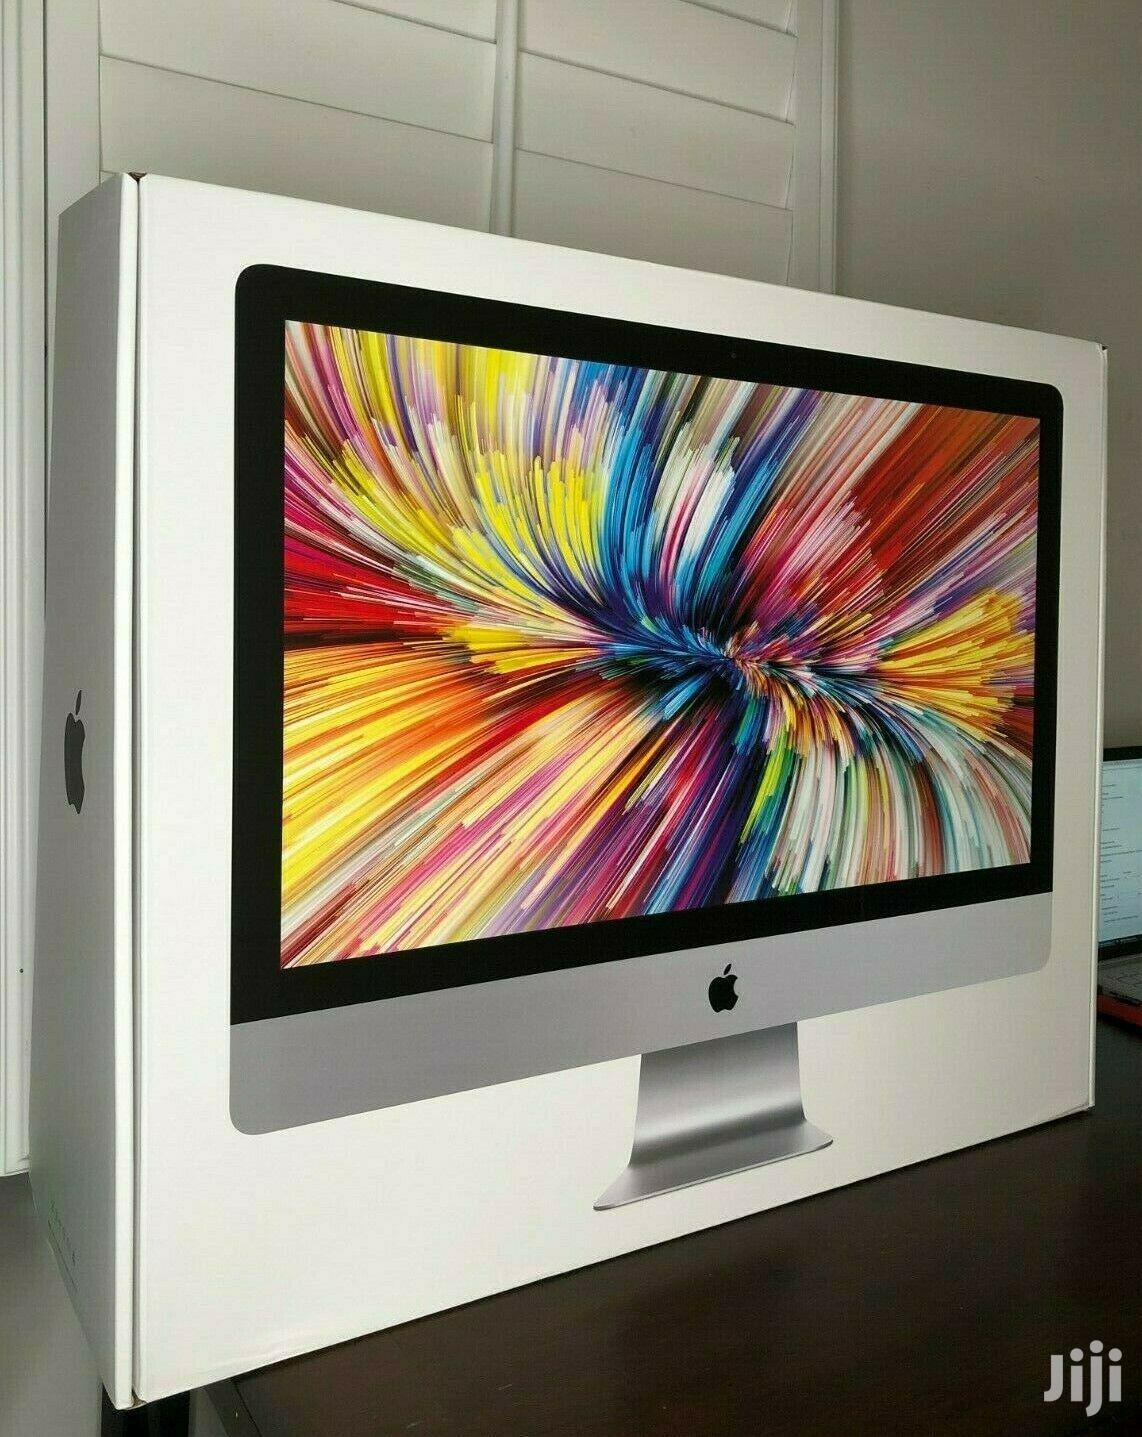 New Desktop Computer Apple iMac Pro 32GB Intel Core i9 SSD 2T